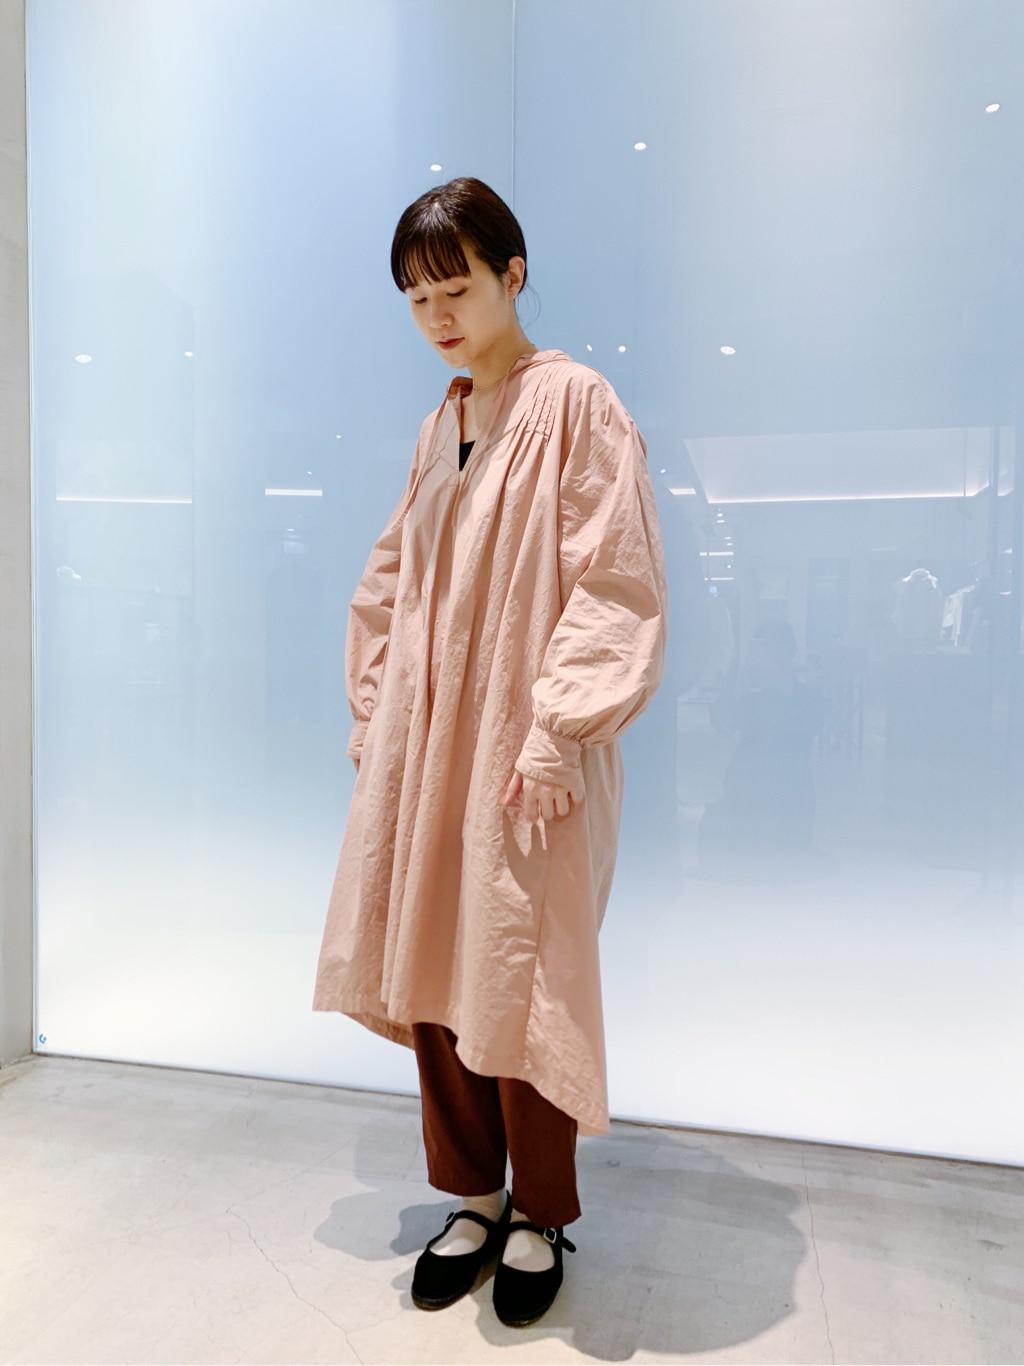 note et silence. 日本橋��島屋S.C. 身長:162cm 2020.02.28